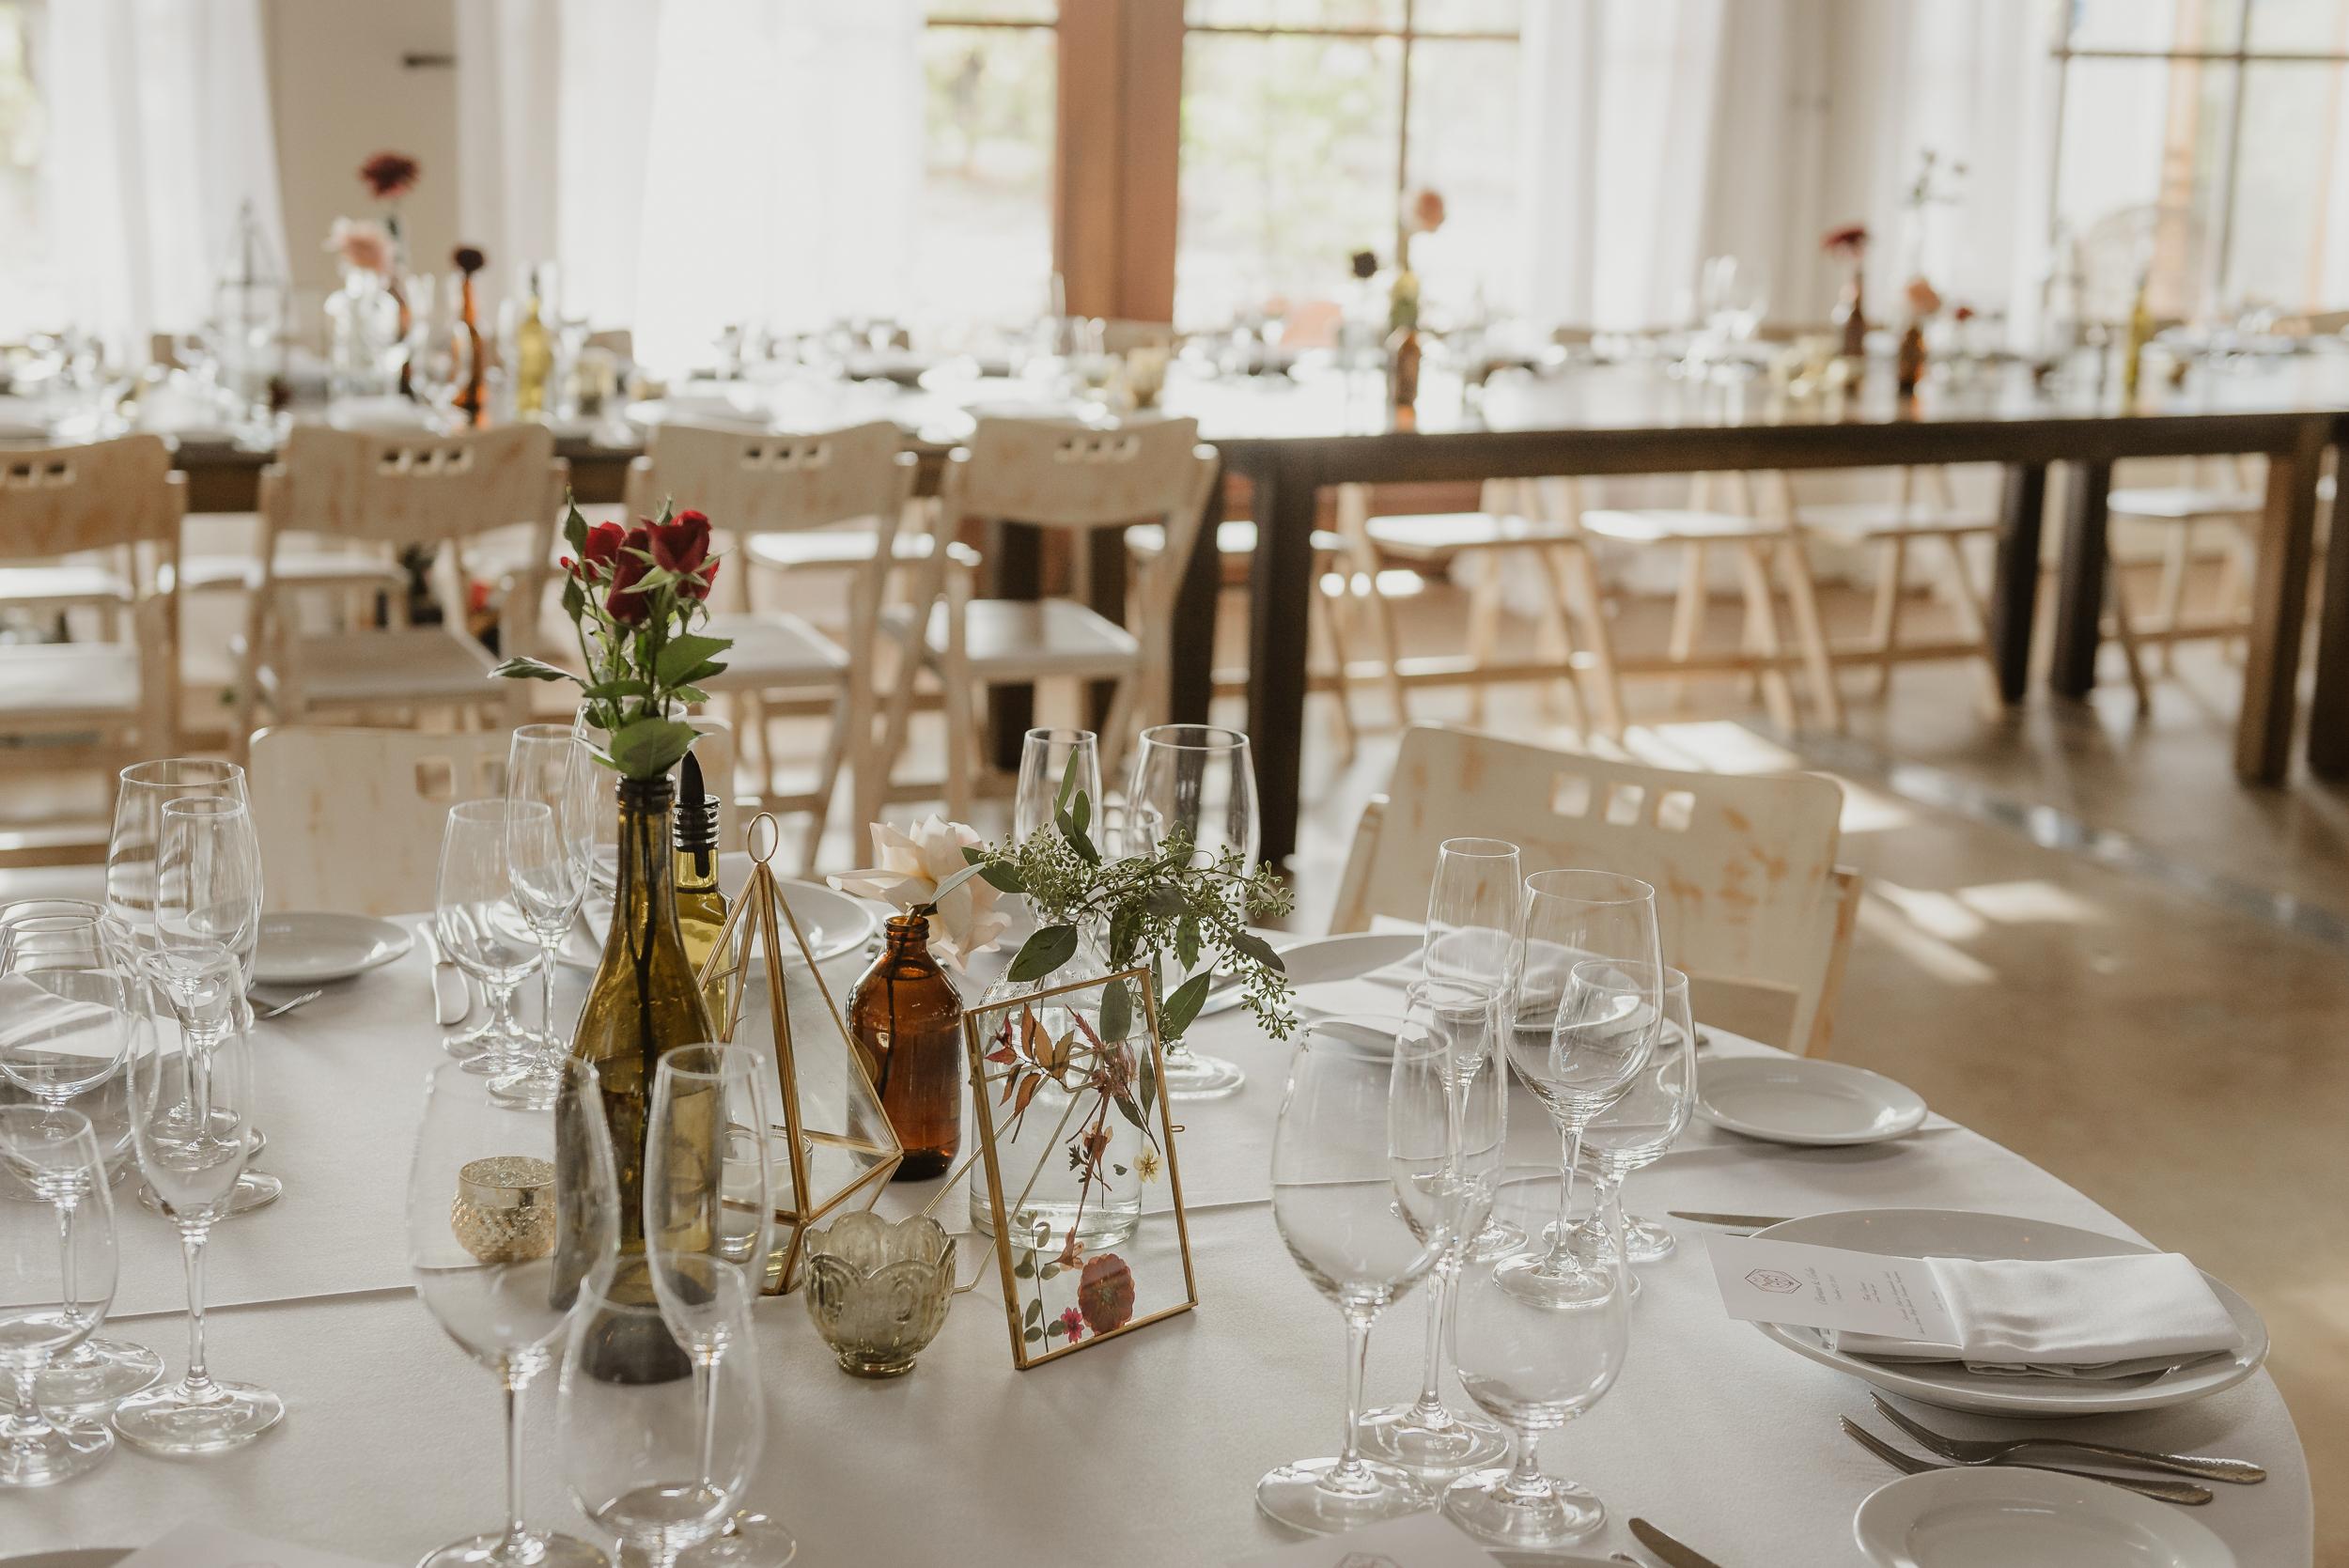 074-healdsburg-soda-rock-winery-wedding-vivianchen-069.jpg